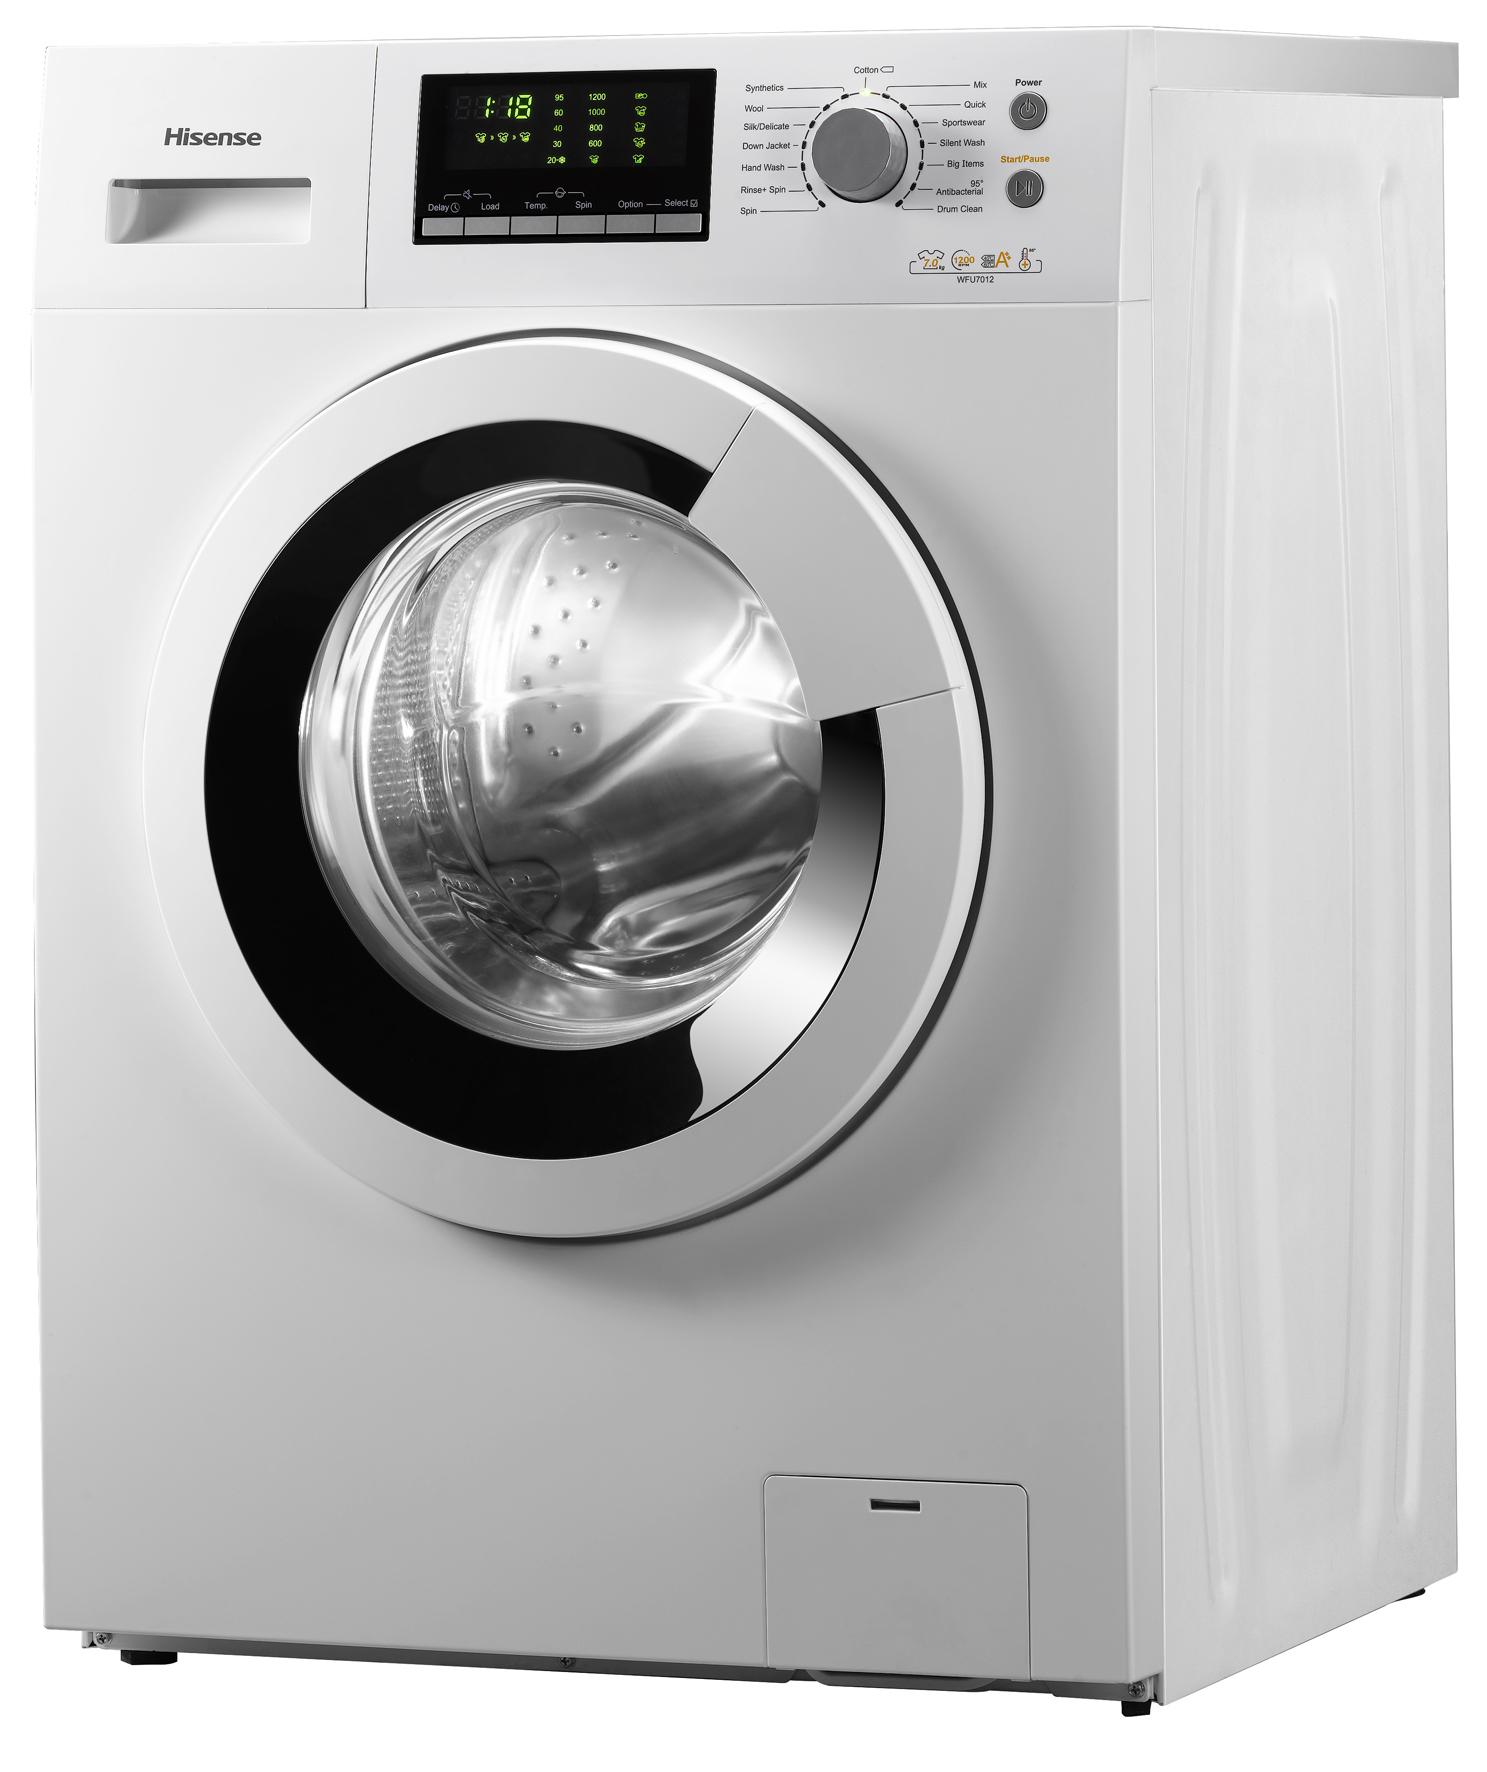 vmarkt illertissen lokal hisense waschmaschine slim. Black Bedroom Furniture Sets. Home Design Ideas